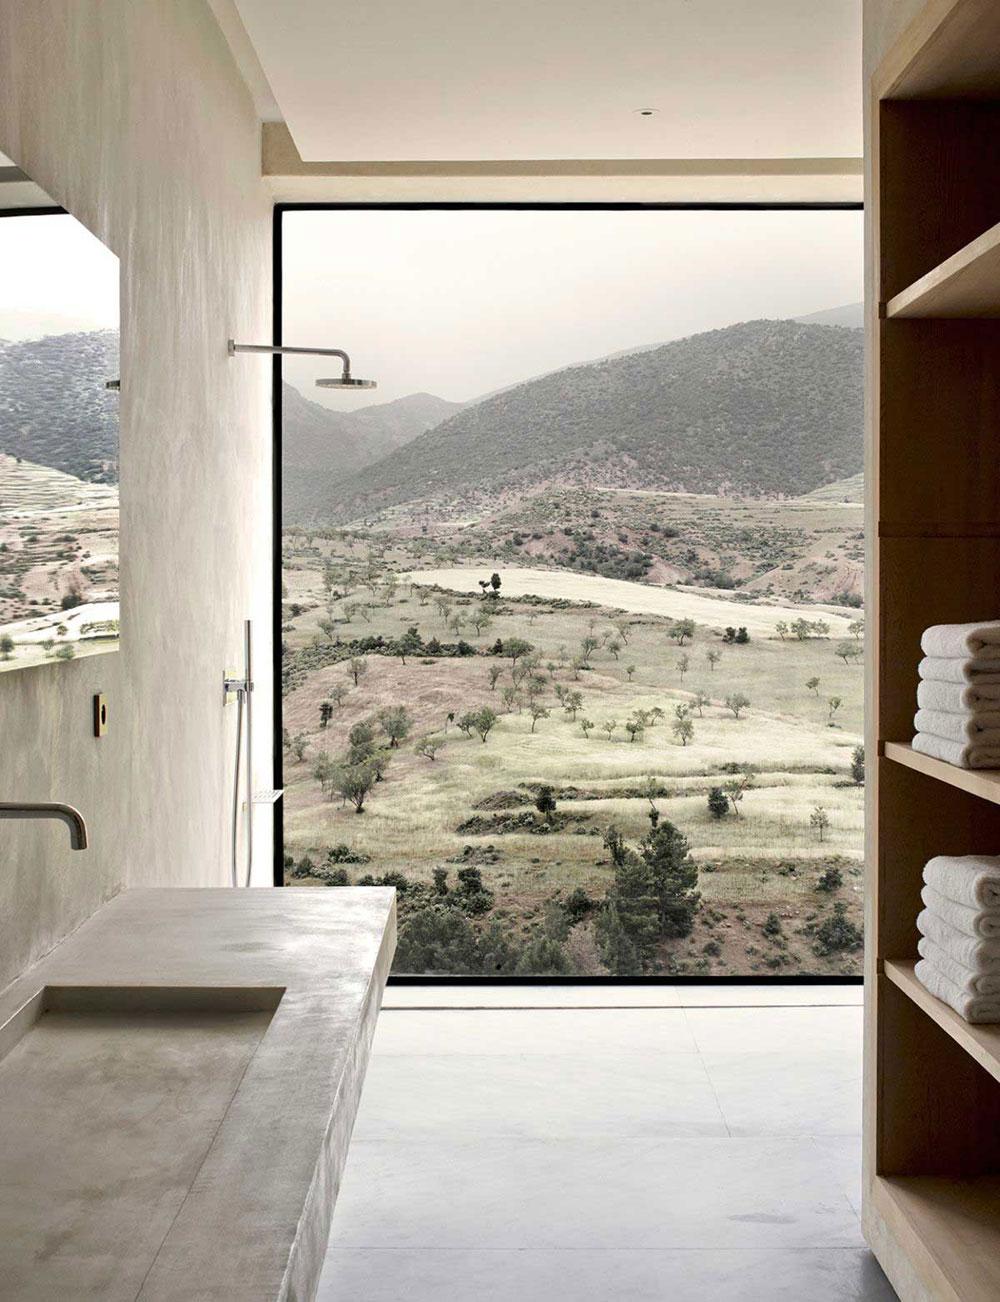 Moroccan, Home, Interior, Industrial, Minimal Inspiration, Bathroom, View, Oracle Fox